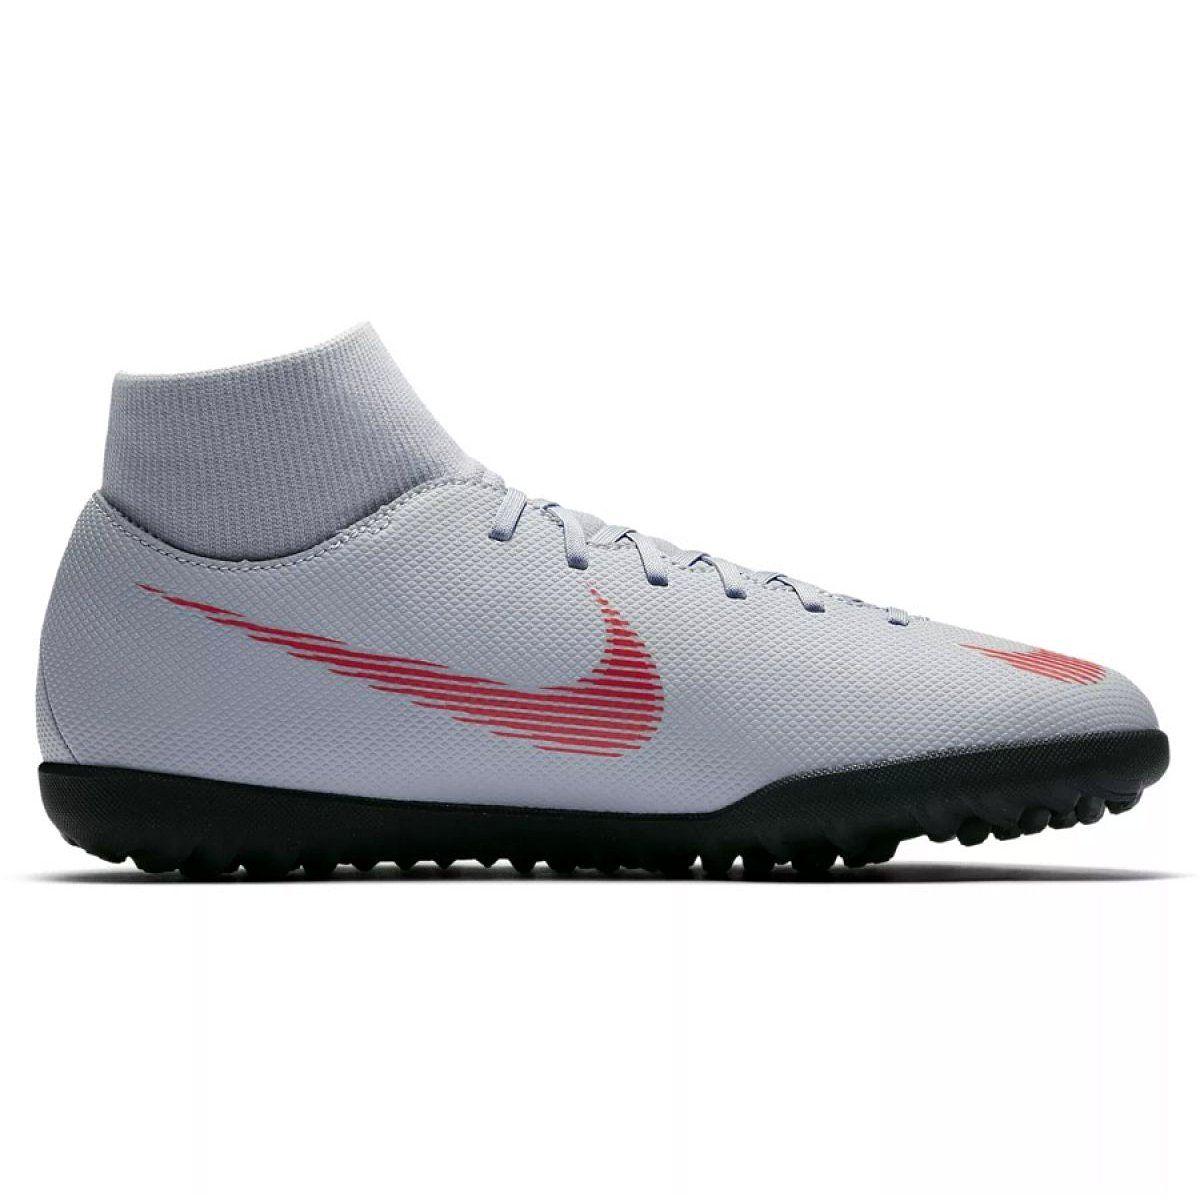 Buty Pilkarskie Nike Mercurial Superflyx 6 Club Tf M Ah7372 060 Szare Szare Football Shoes Nike Football Boots